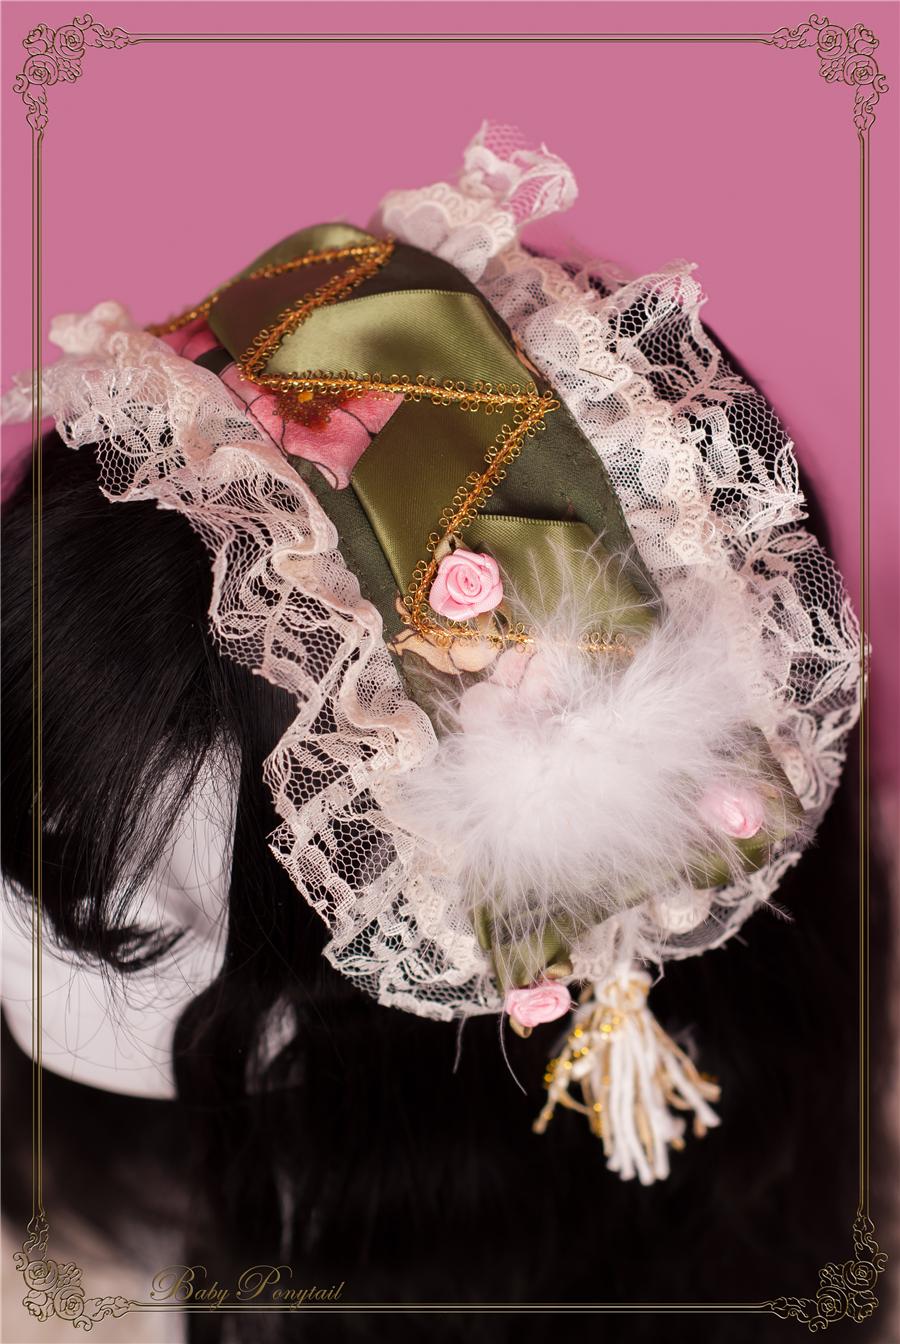 Babyponytail_Accessory_Tassel Head Dress_Green_02.jpg